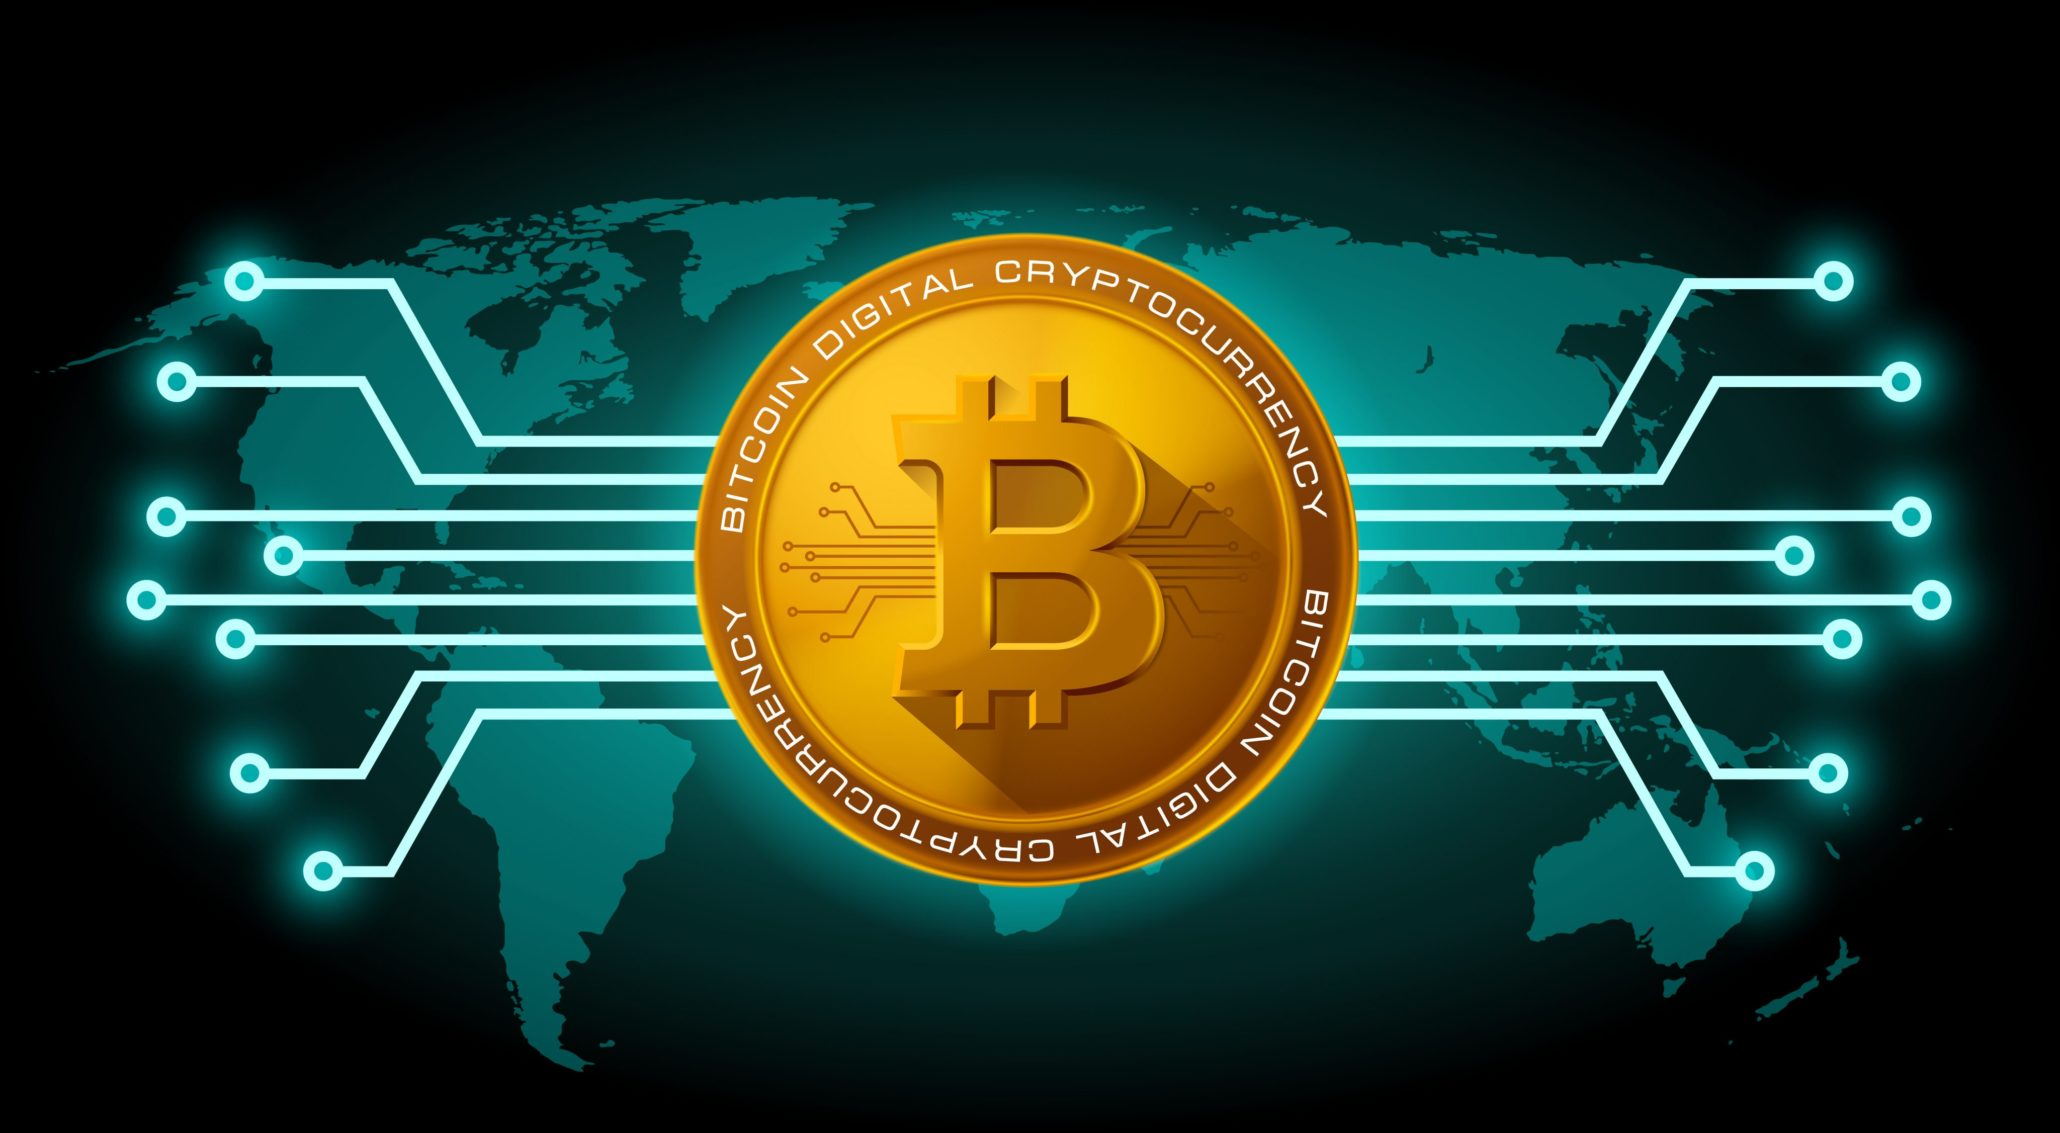 évben megjelent a bitcoin)